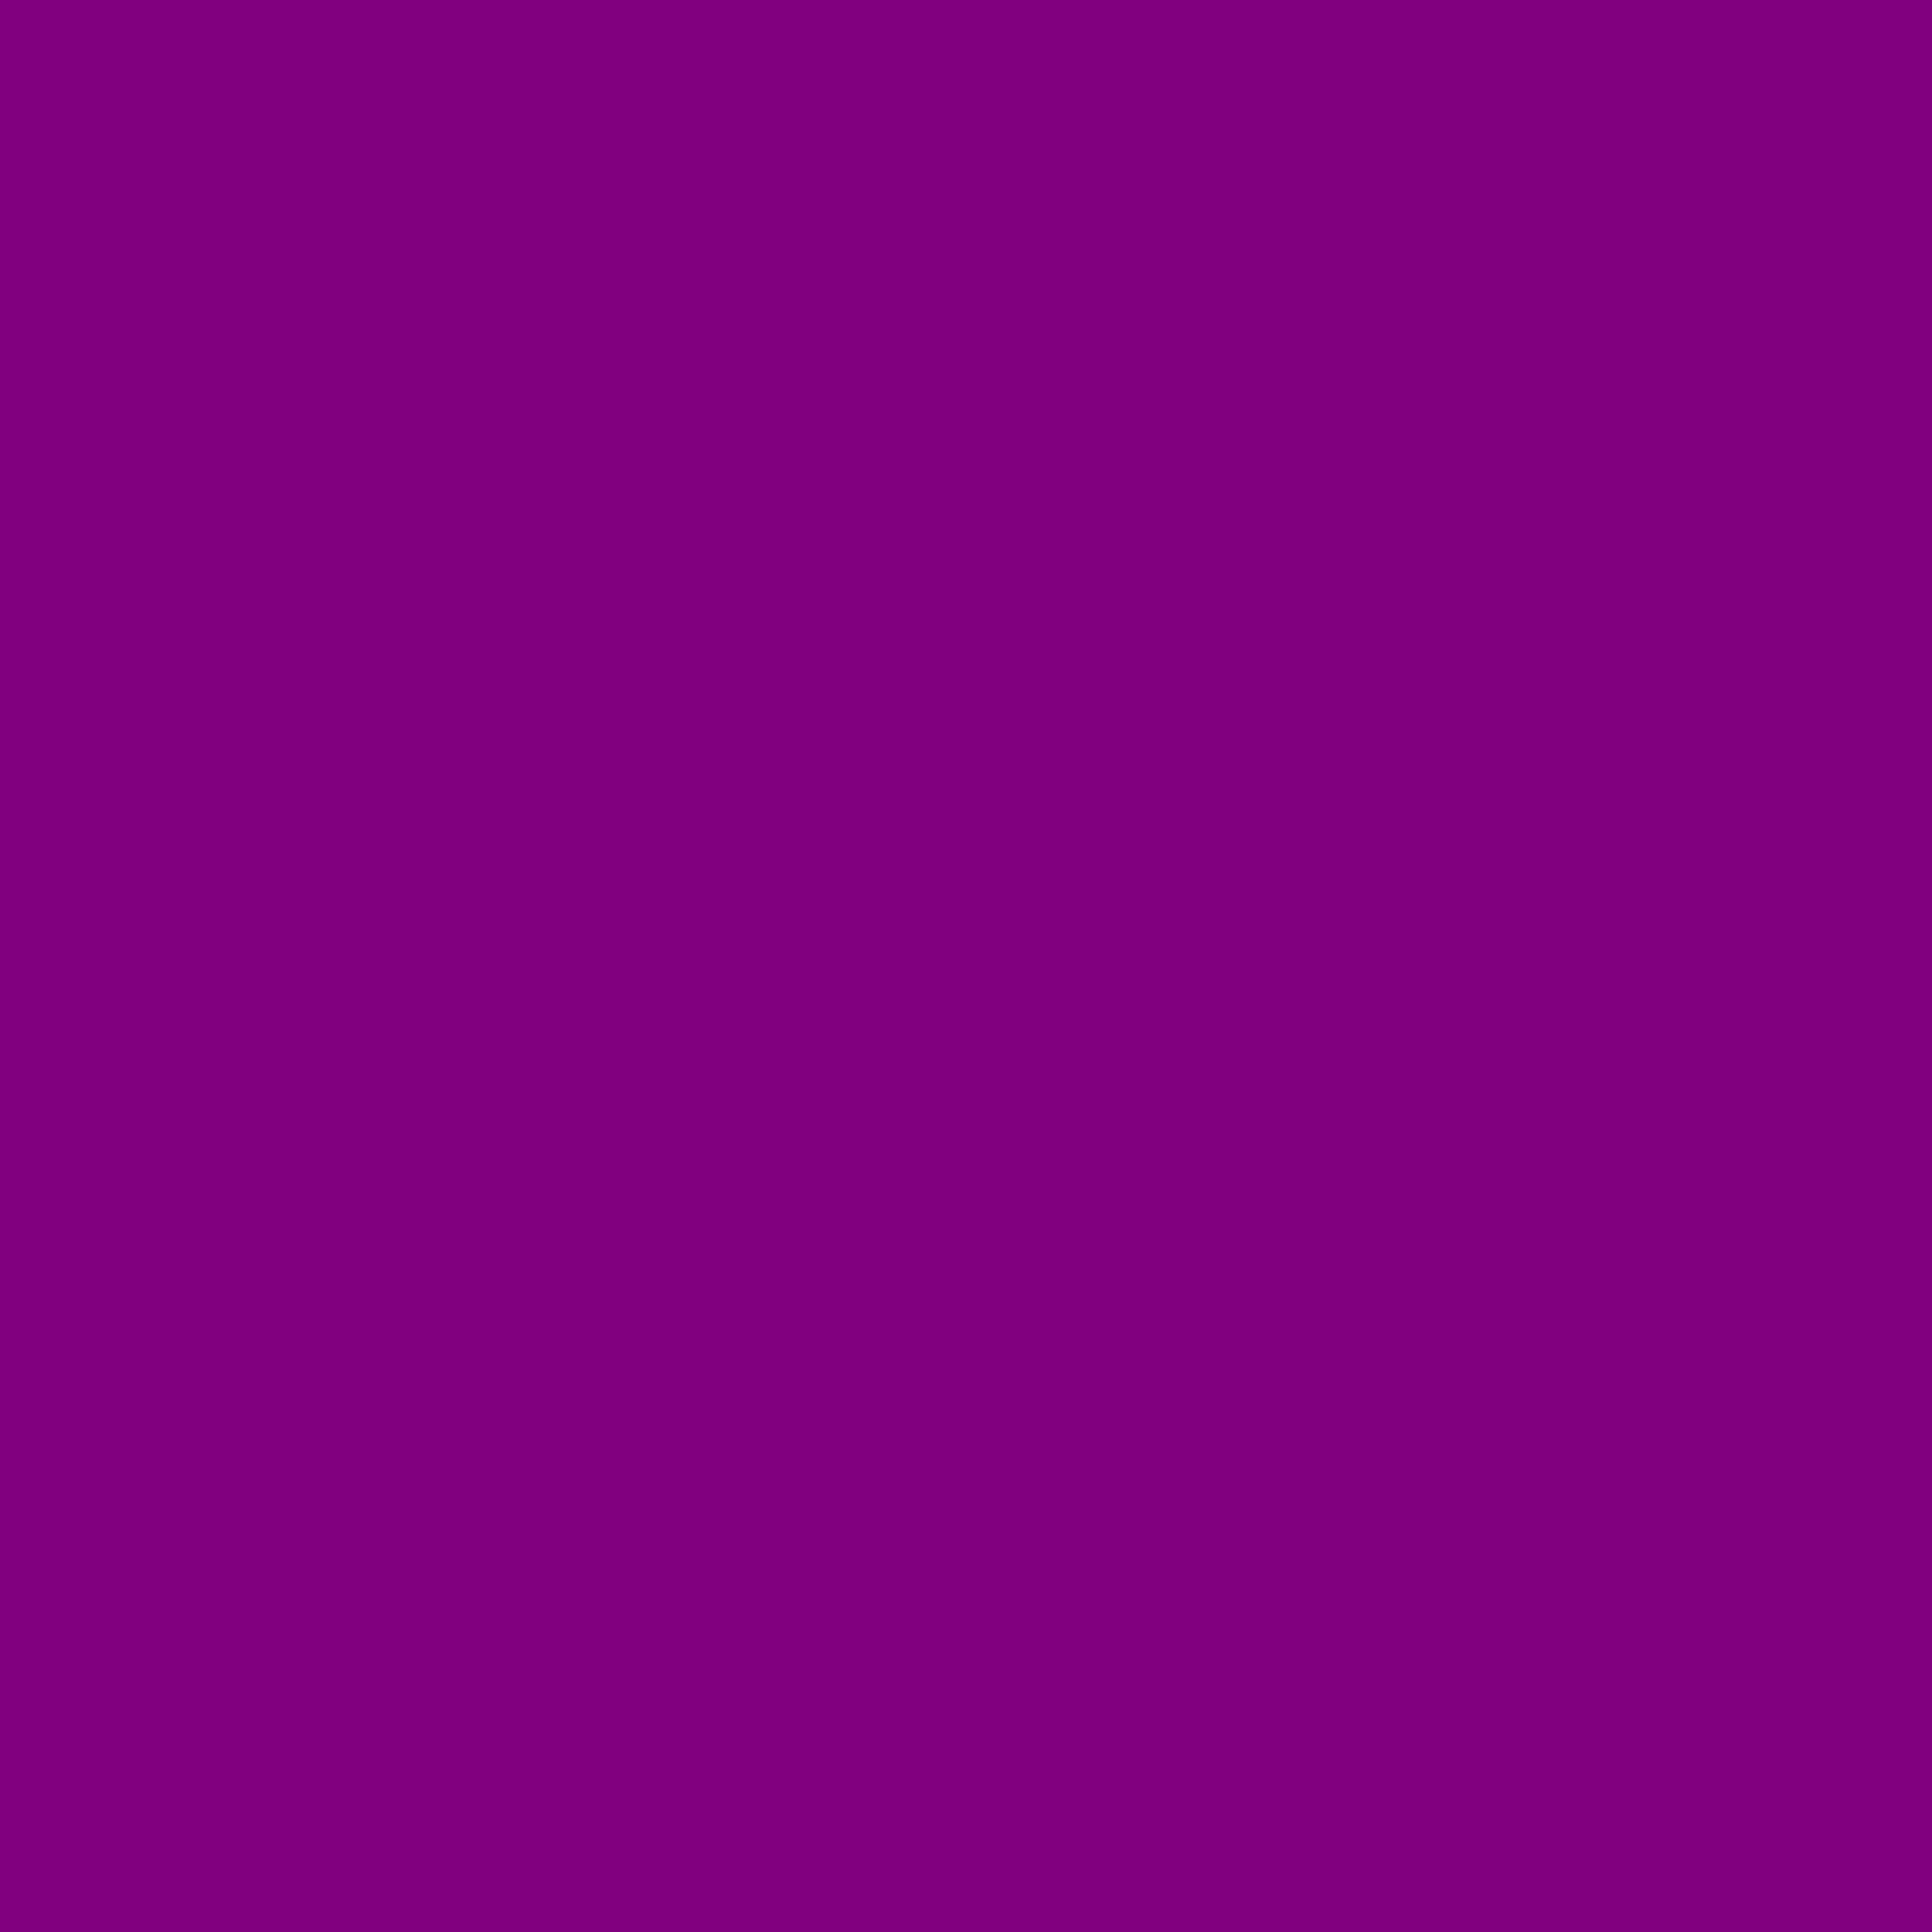 3600x3600 Purple Web Solid Color Background